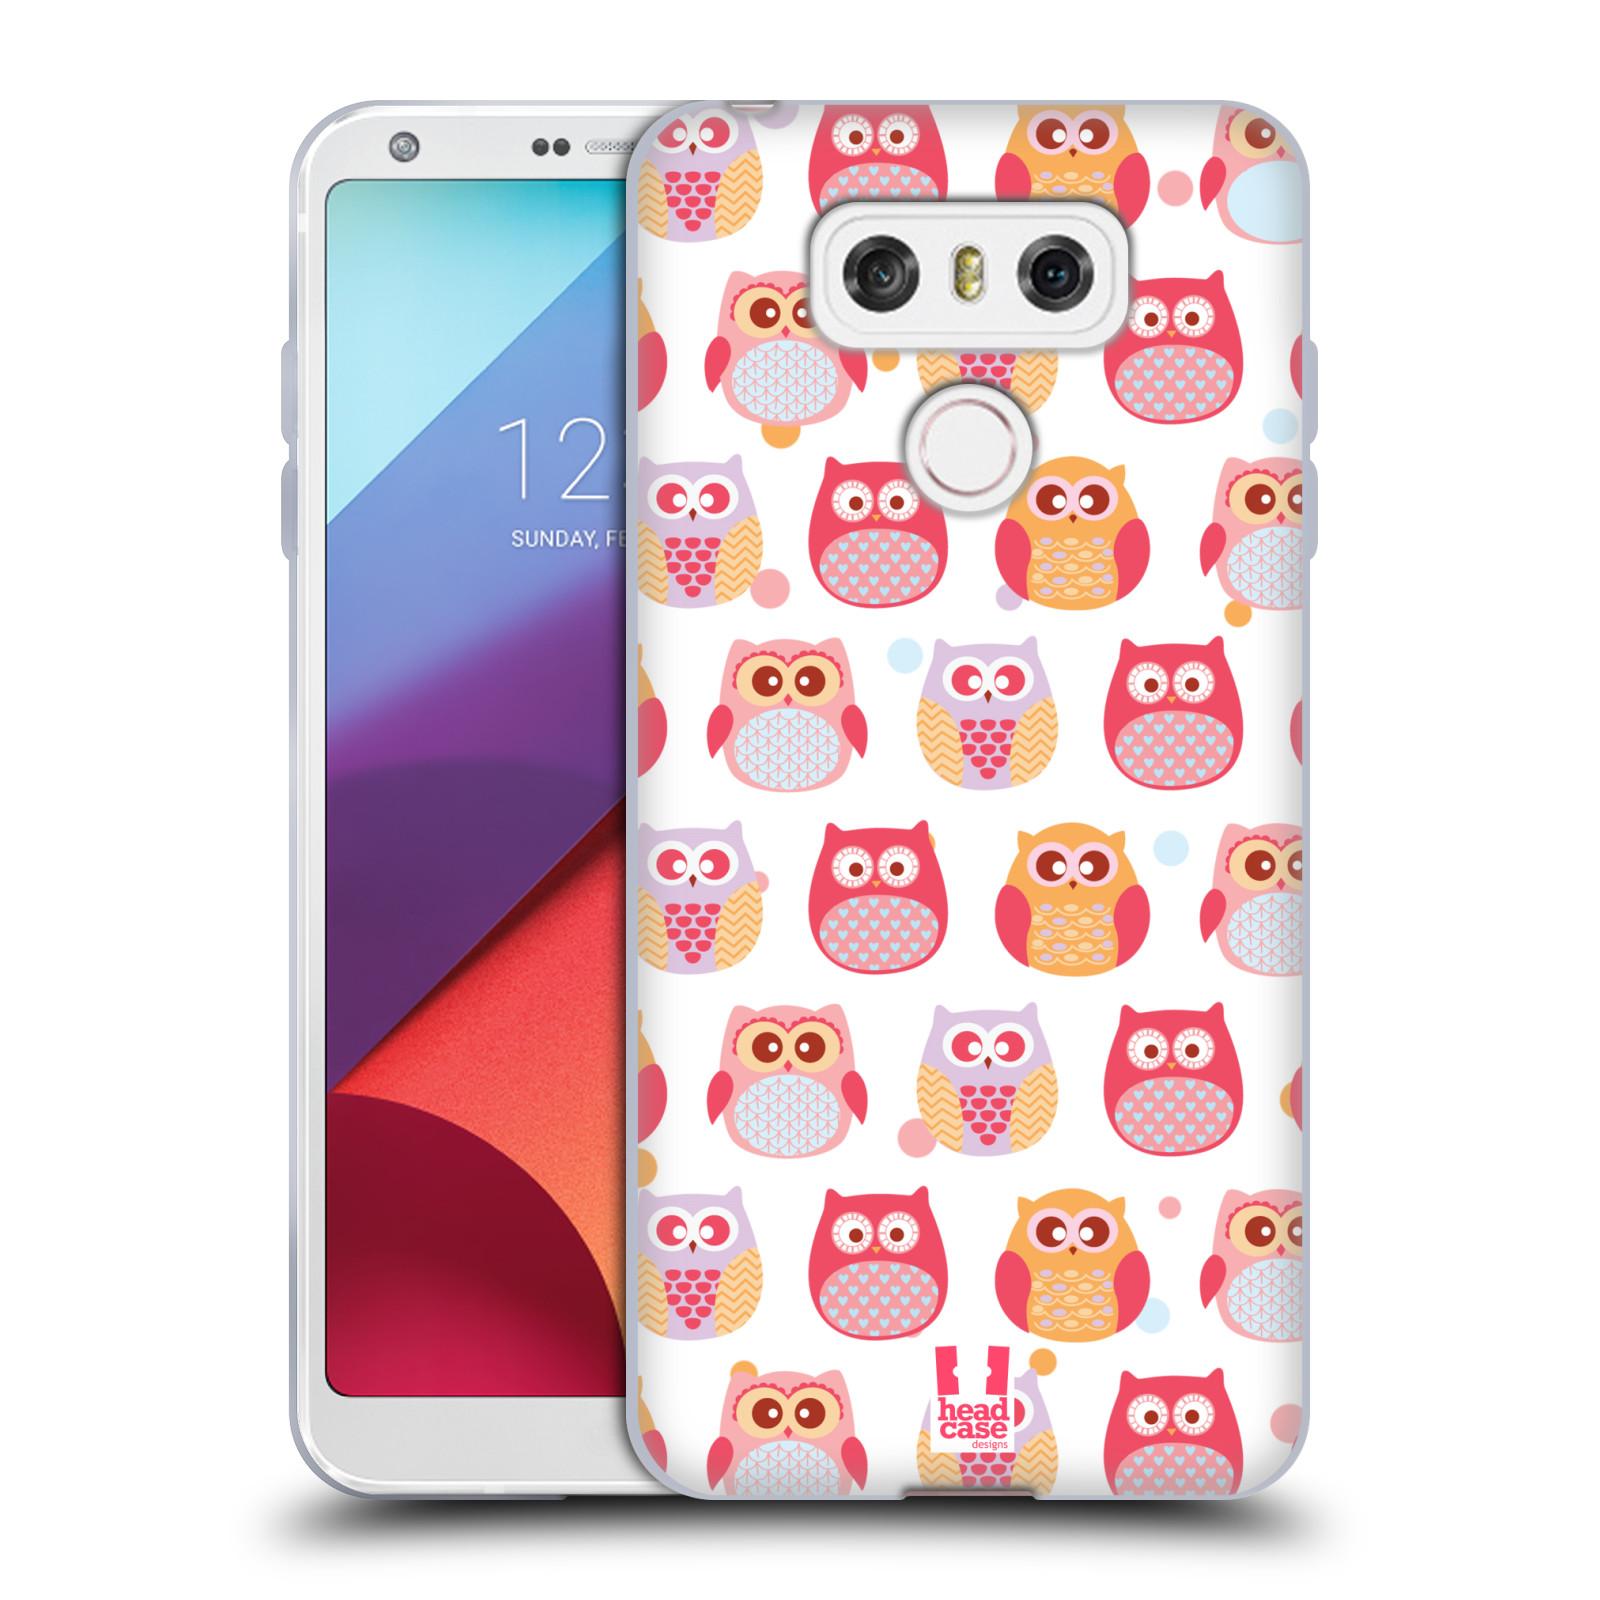 Silikonové pouzdro na mobil LG G6 - Head Case SOVIČKY VYKULENÉ (Silikonový kryt či obal na mobilní telefon LG G6 H870 / LG G6 Dual SIM H870DS)